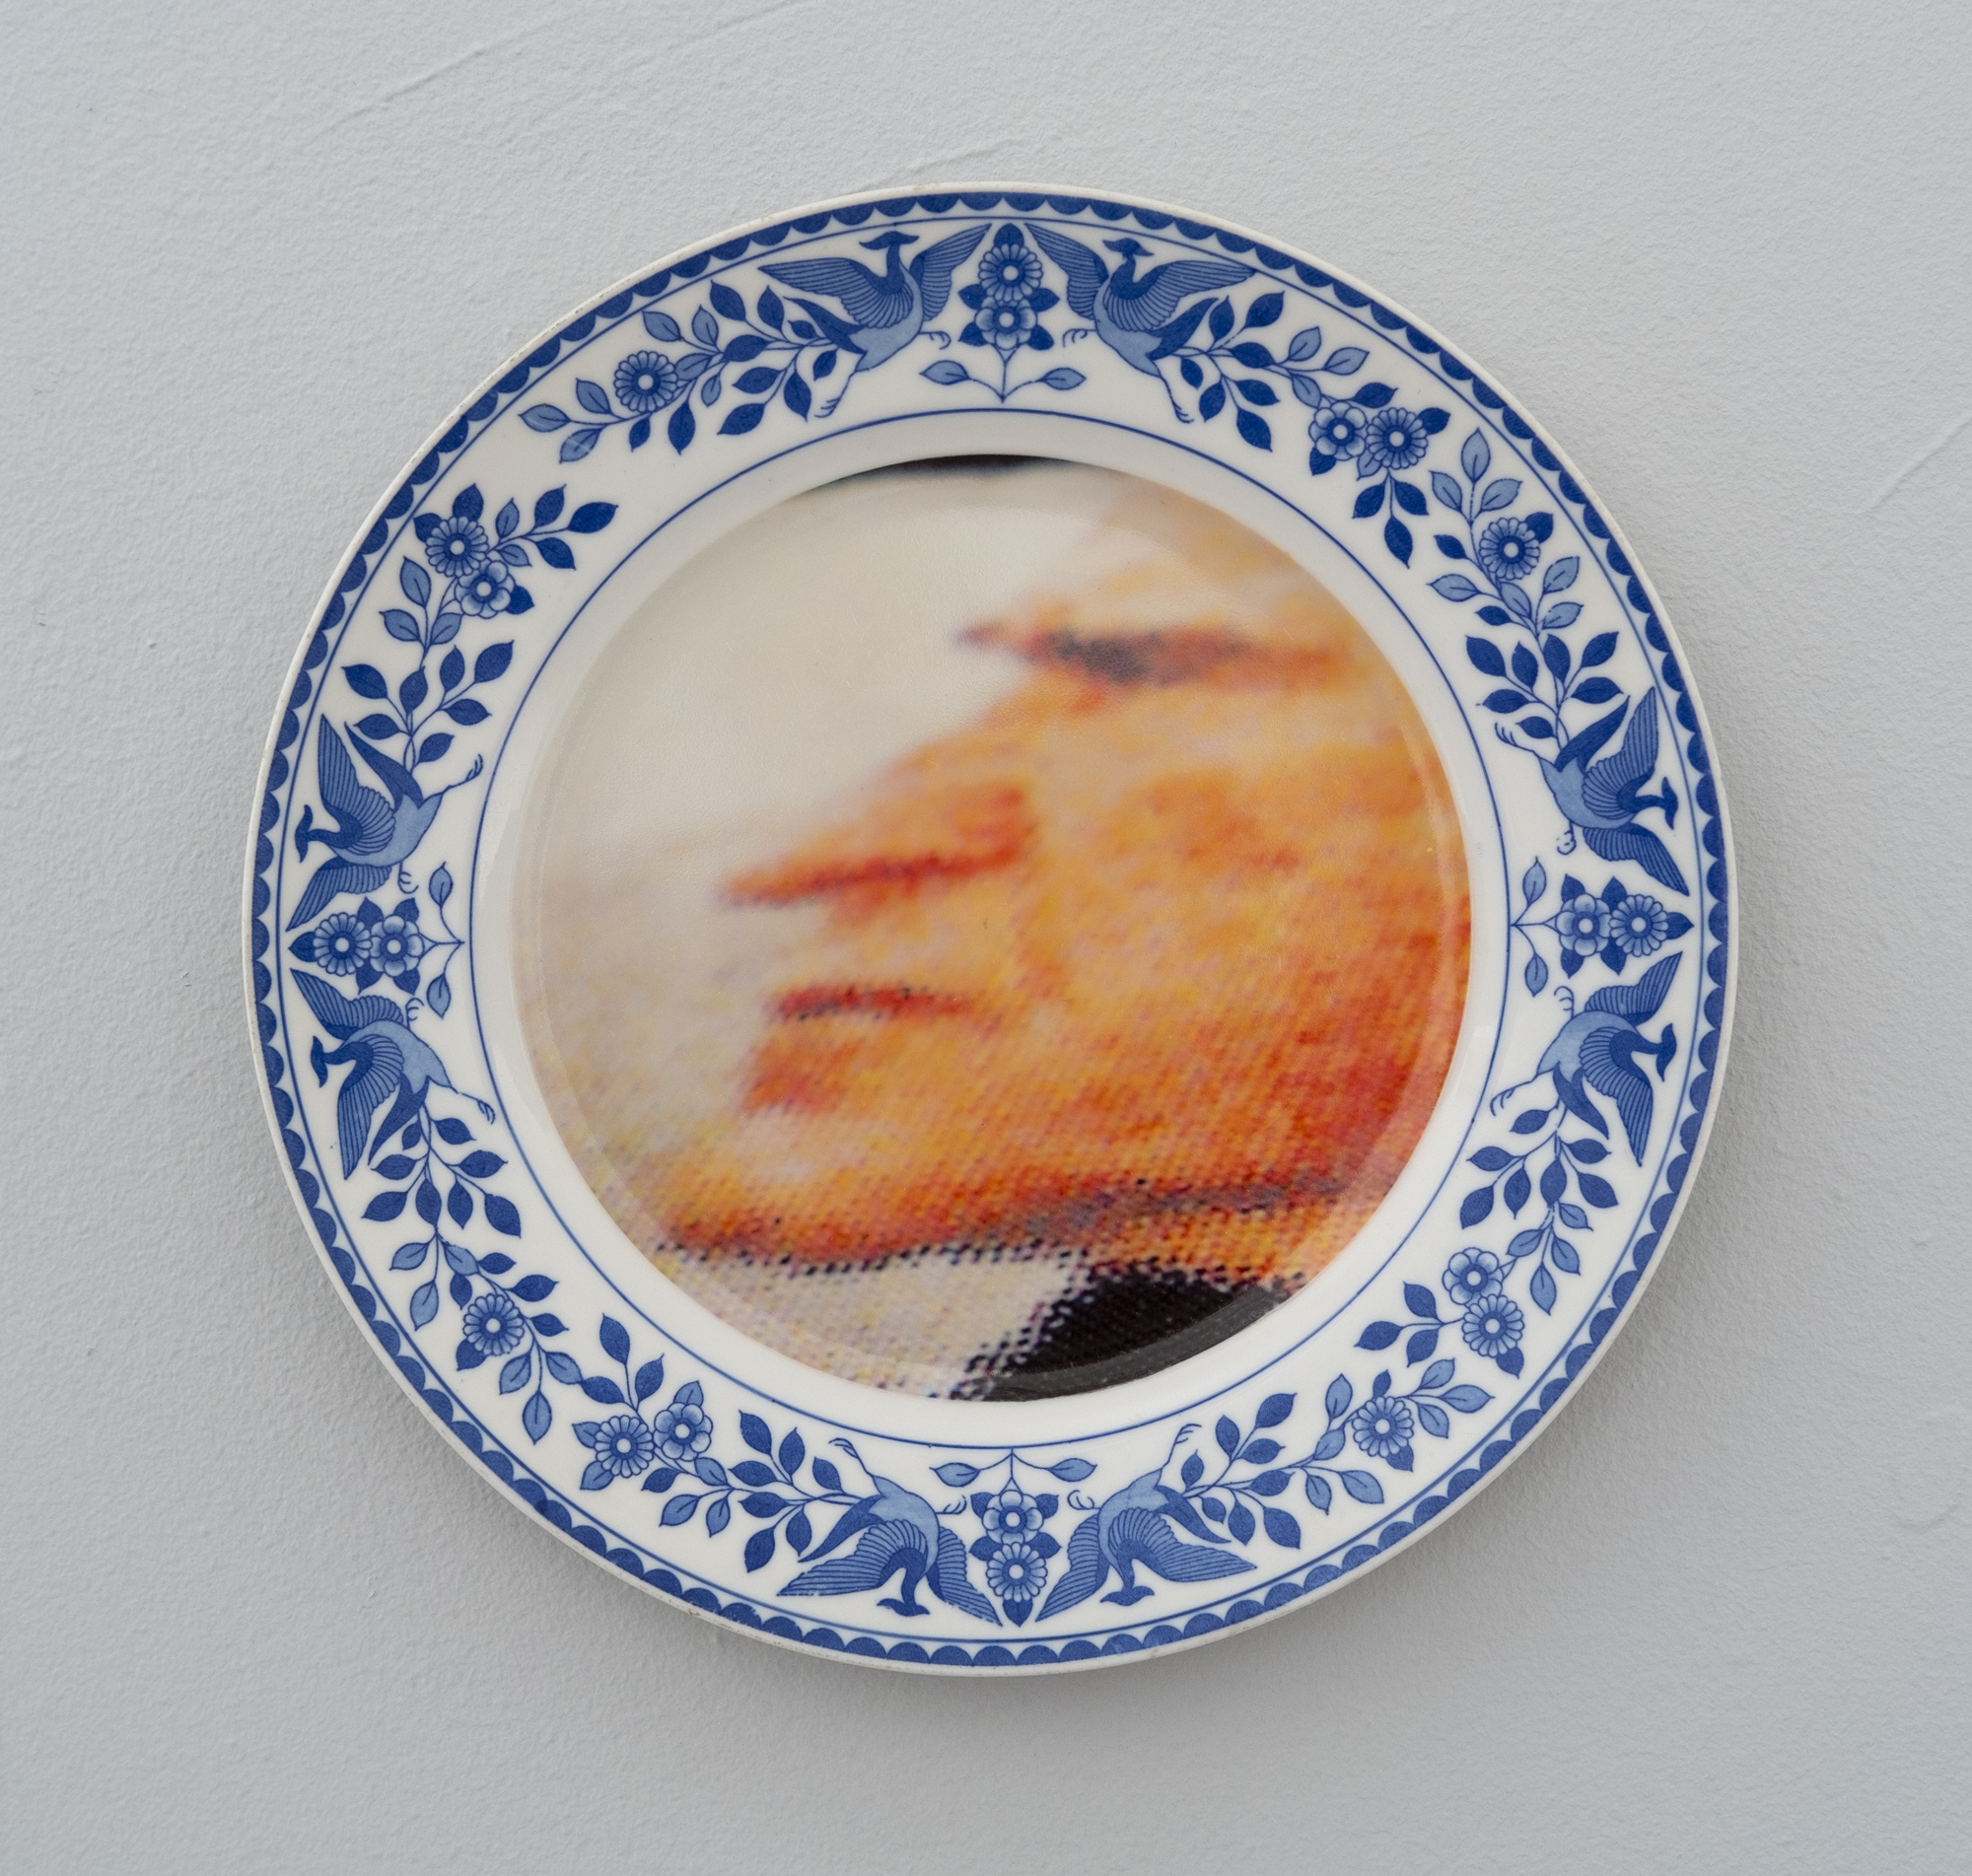 Bean Gilsdorf,  George H. W. Bush , 2018, Ceramic plate, 9.75 inch diameter